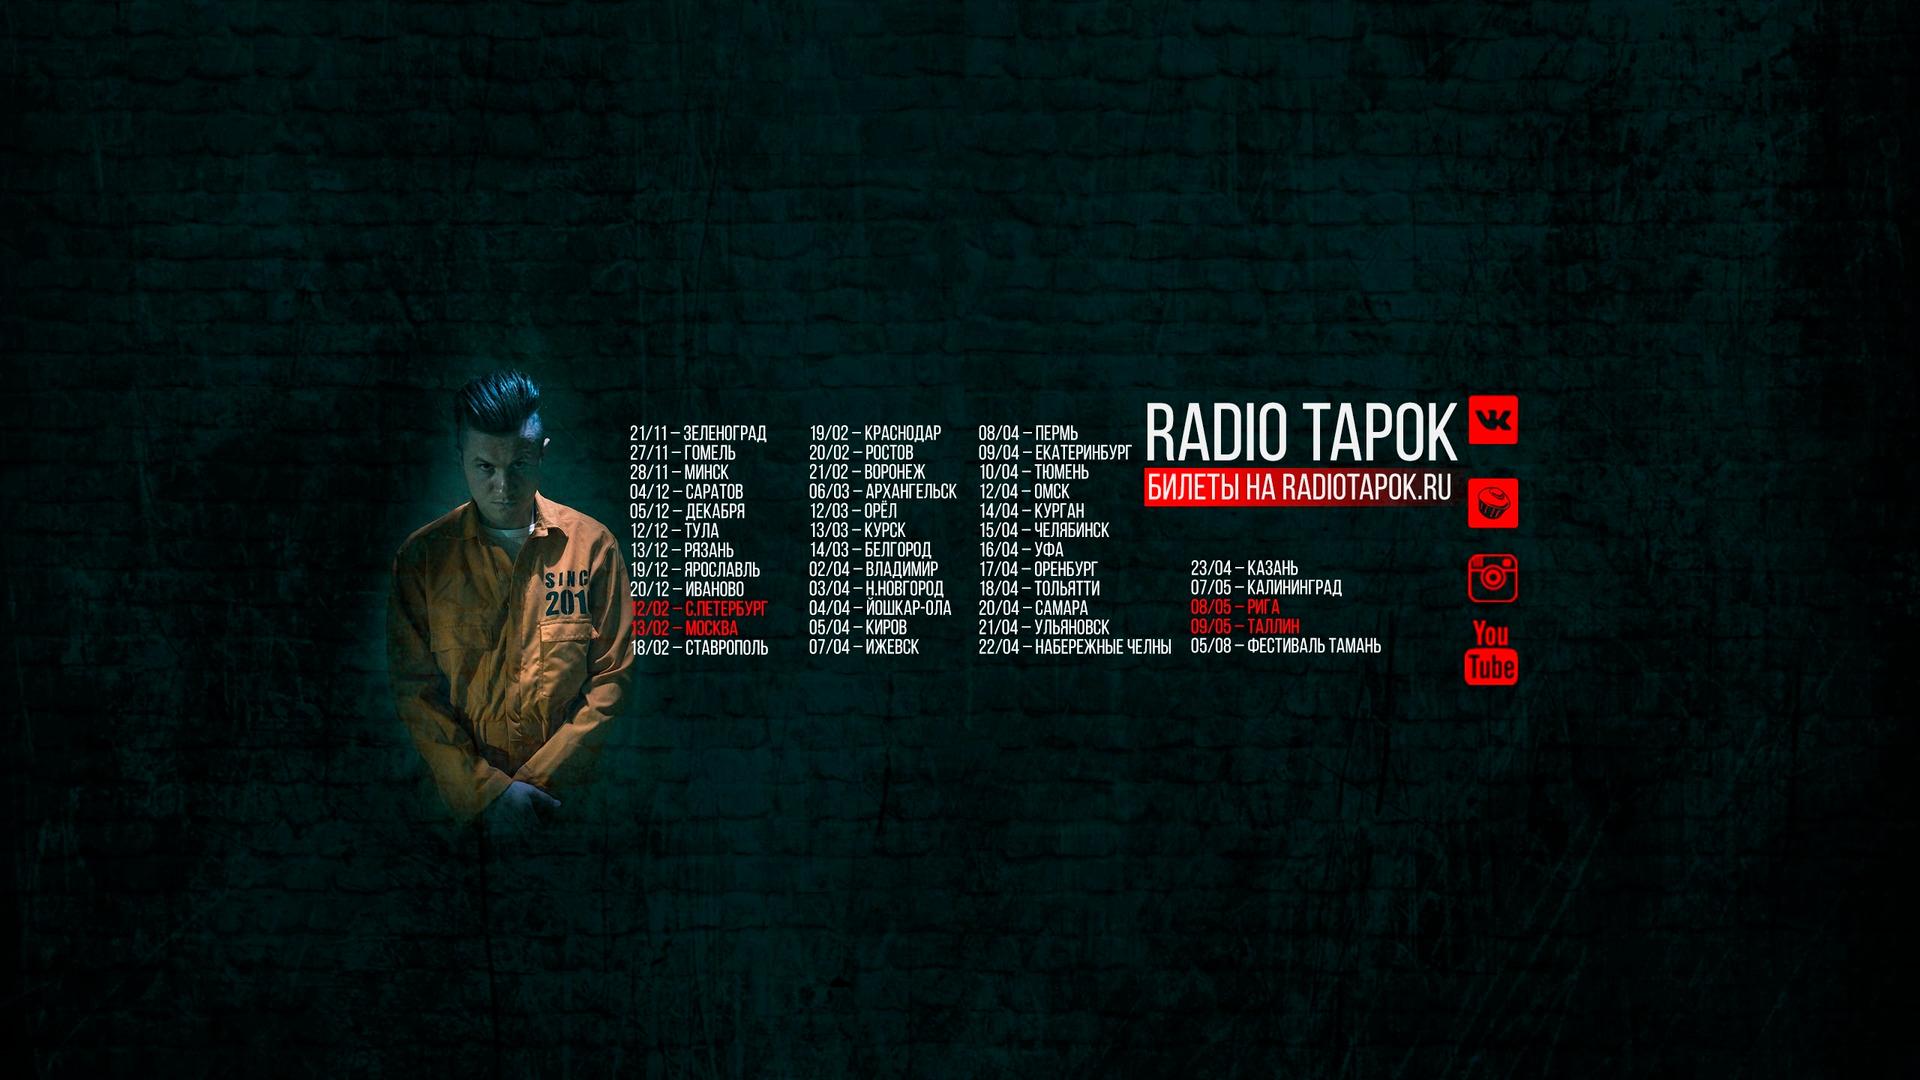 Сериал RADIO TAPOK